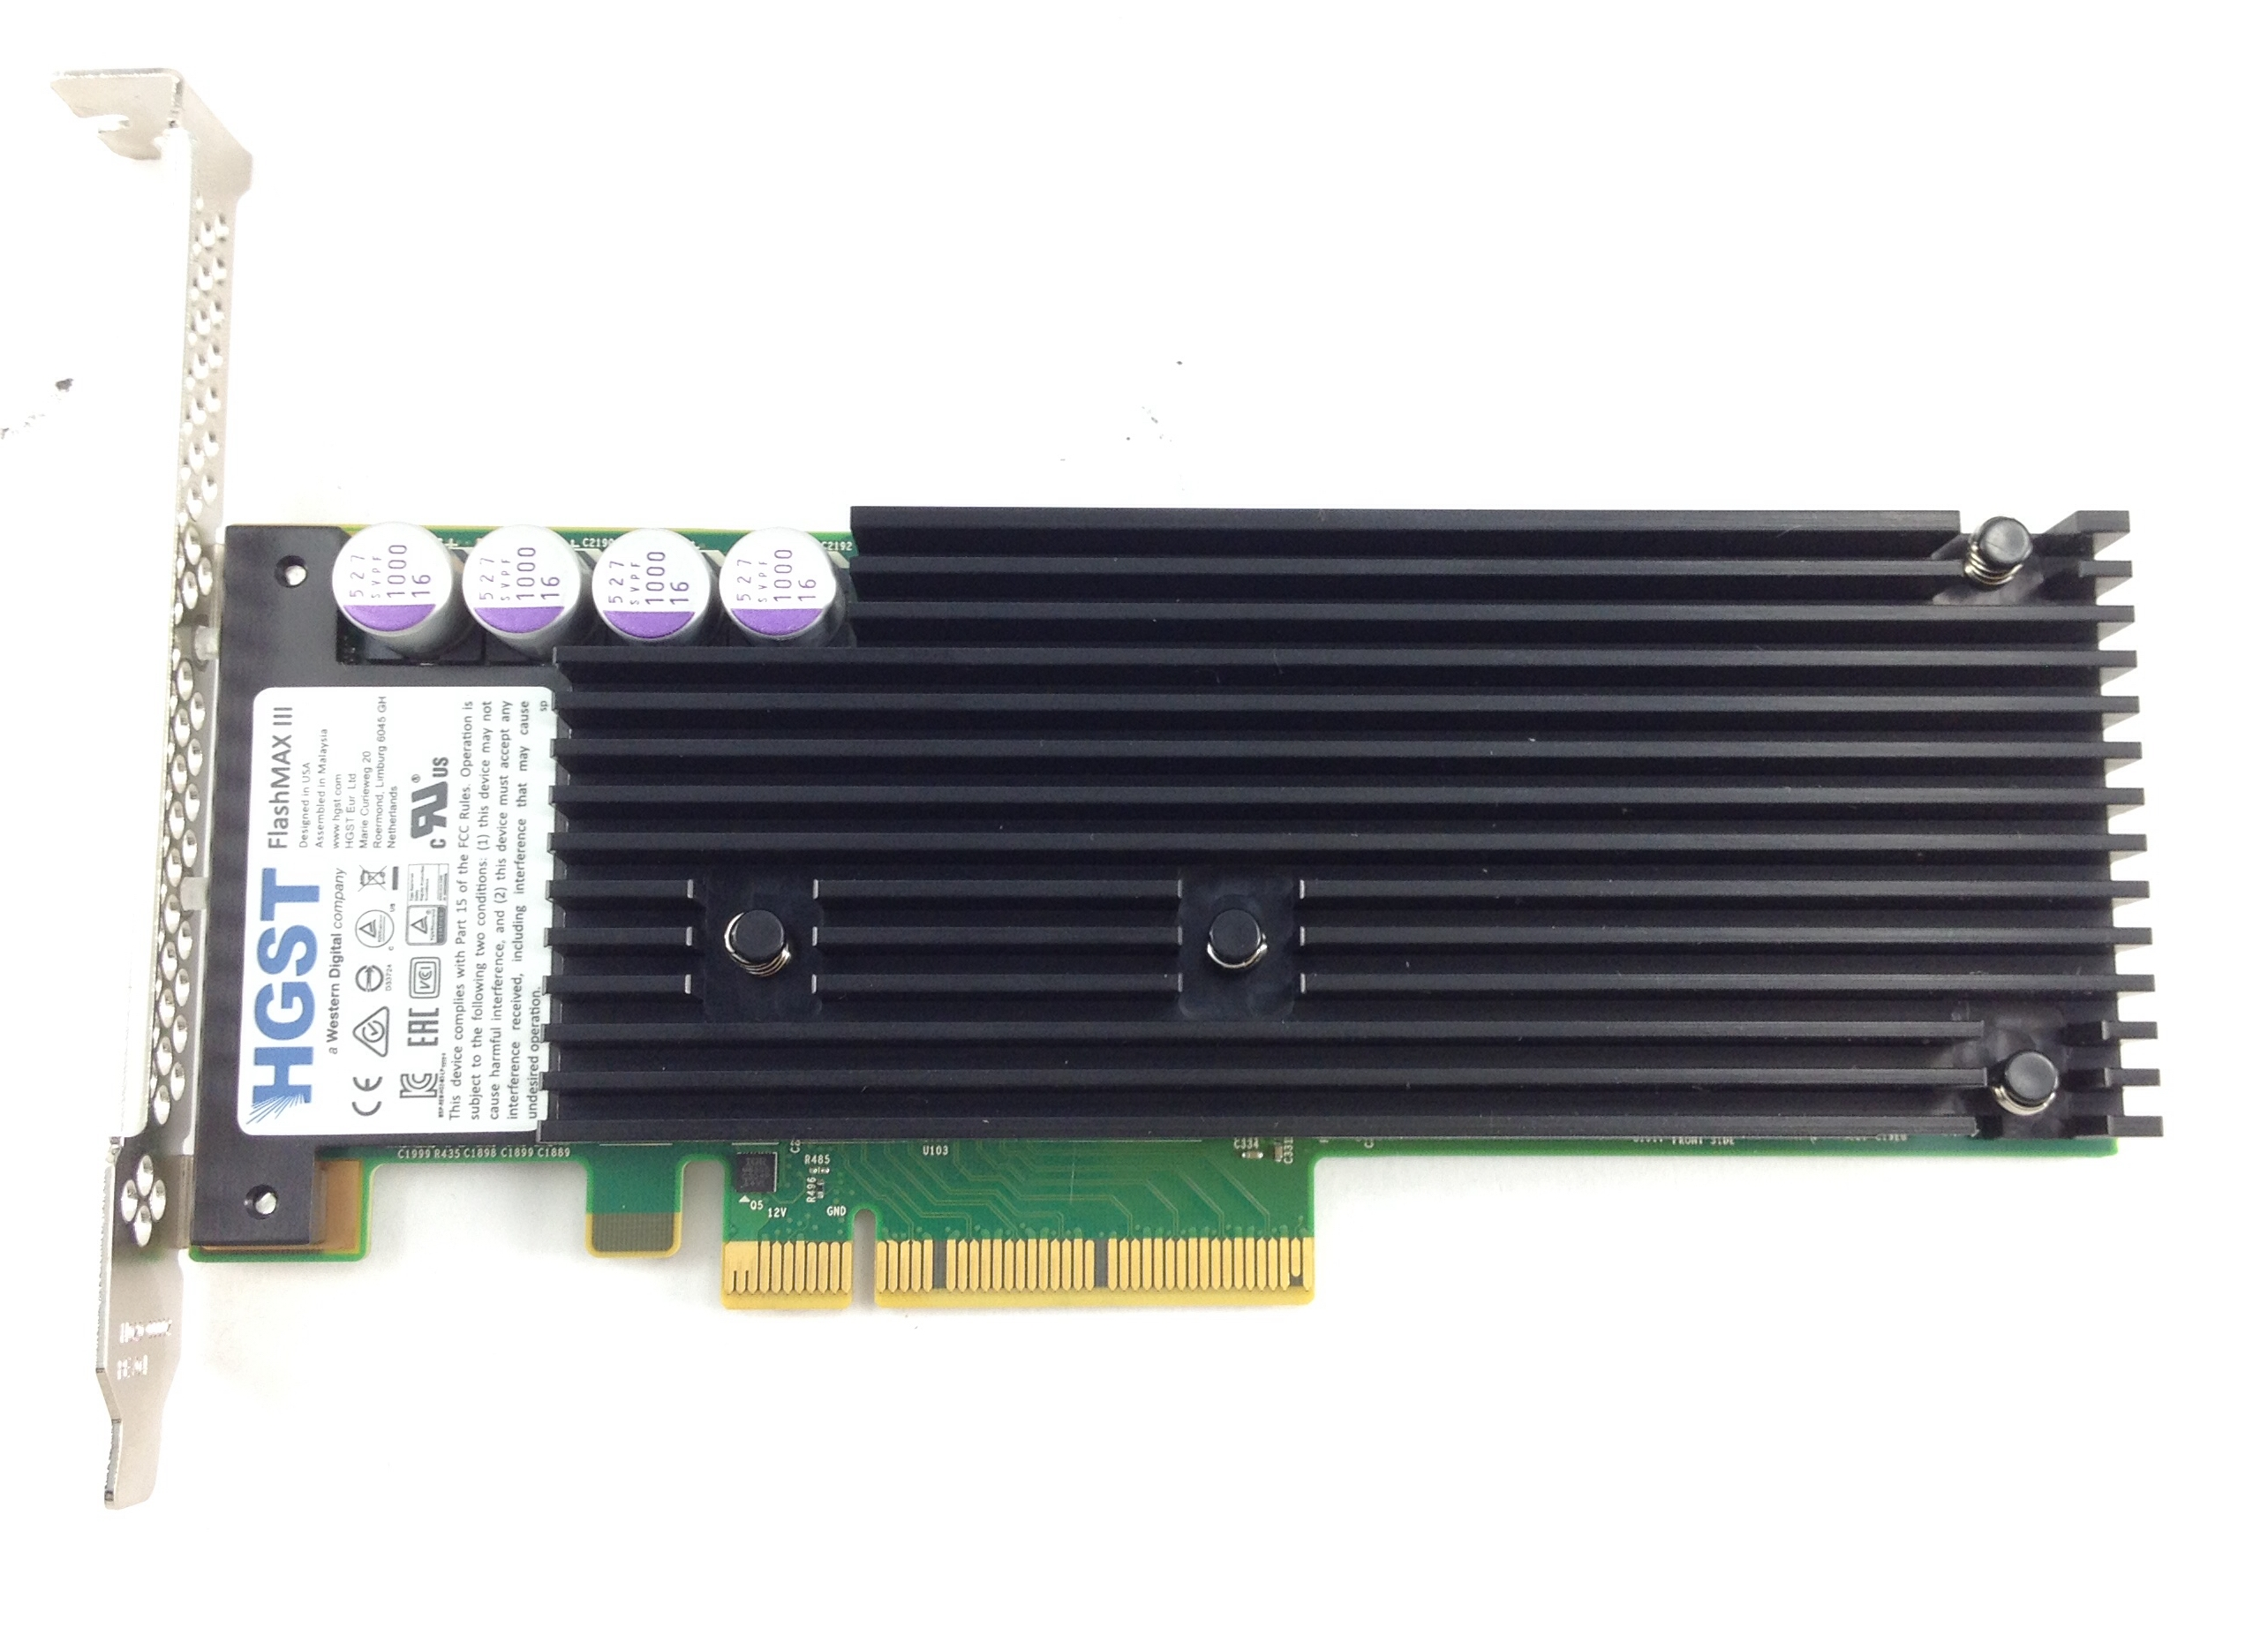 Hgst Virident Flashmax Iii PCI-E 3.0 2.2TB Flash Solid State  Drive  SSD (LNK-M3-LP-2200-1A)